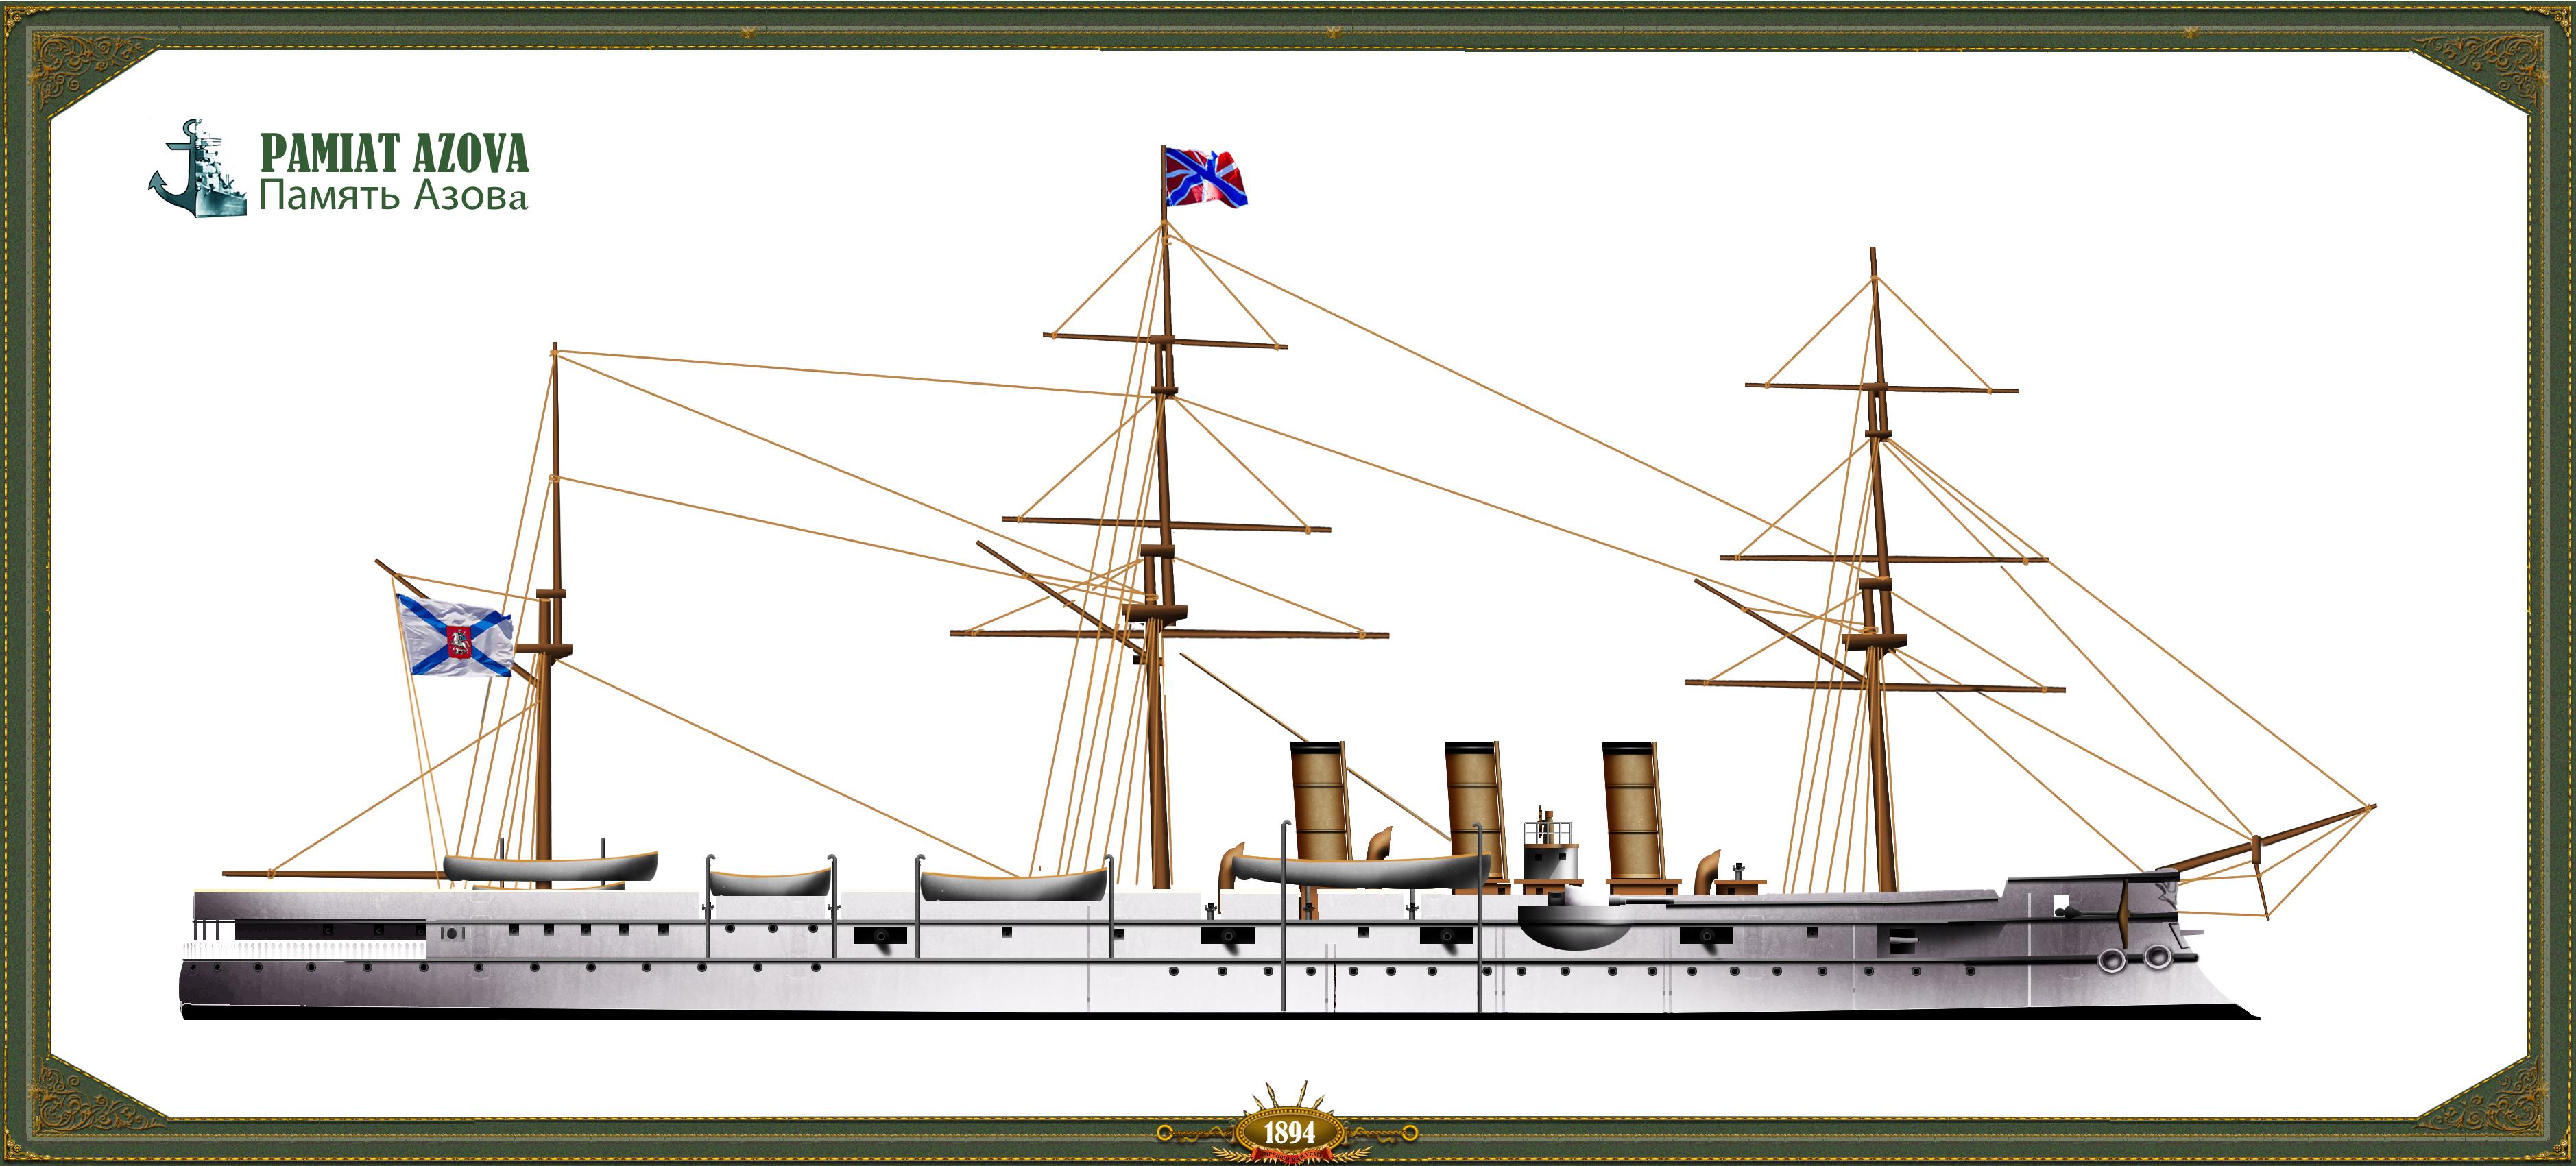 Pamiat Azova 1894